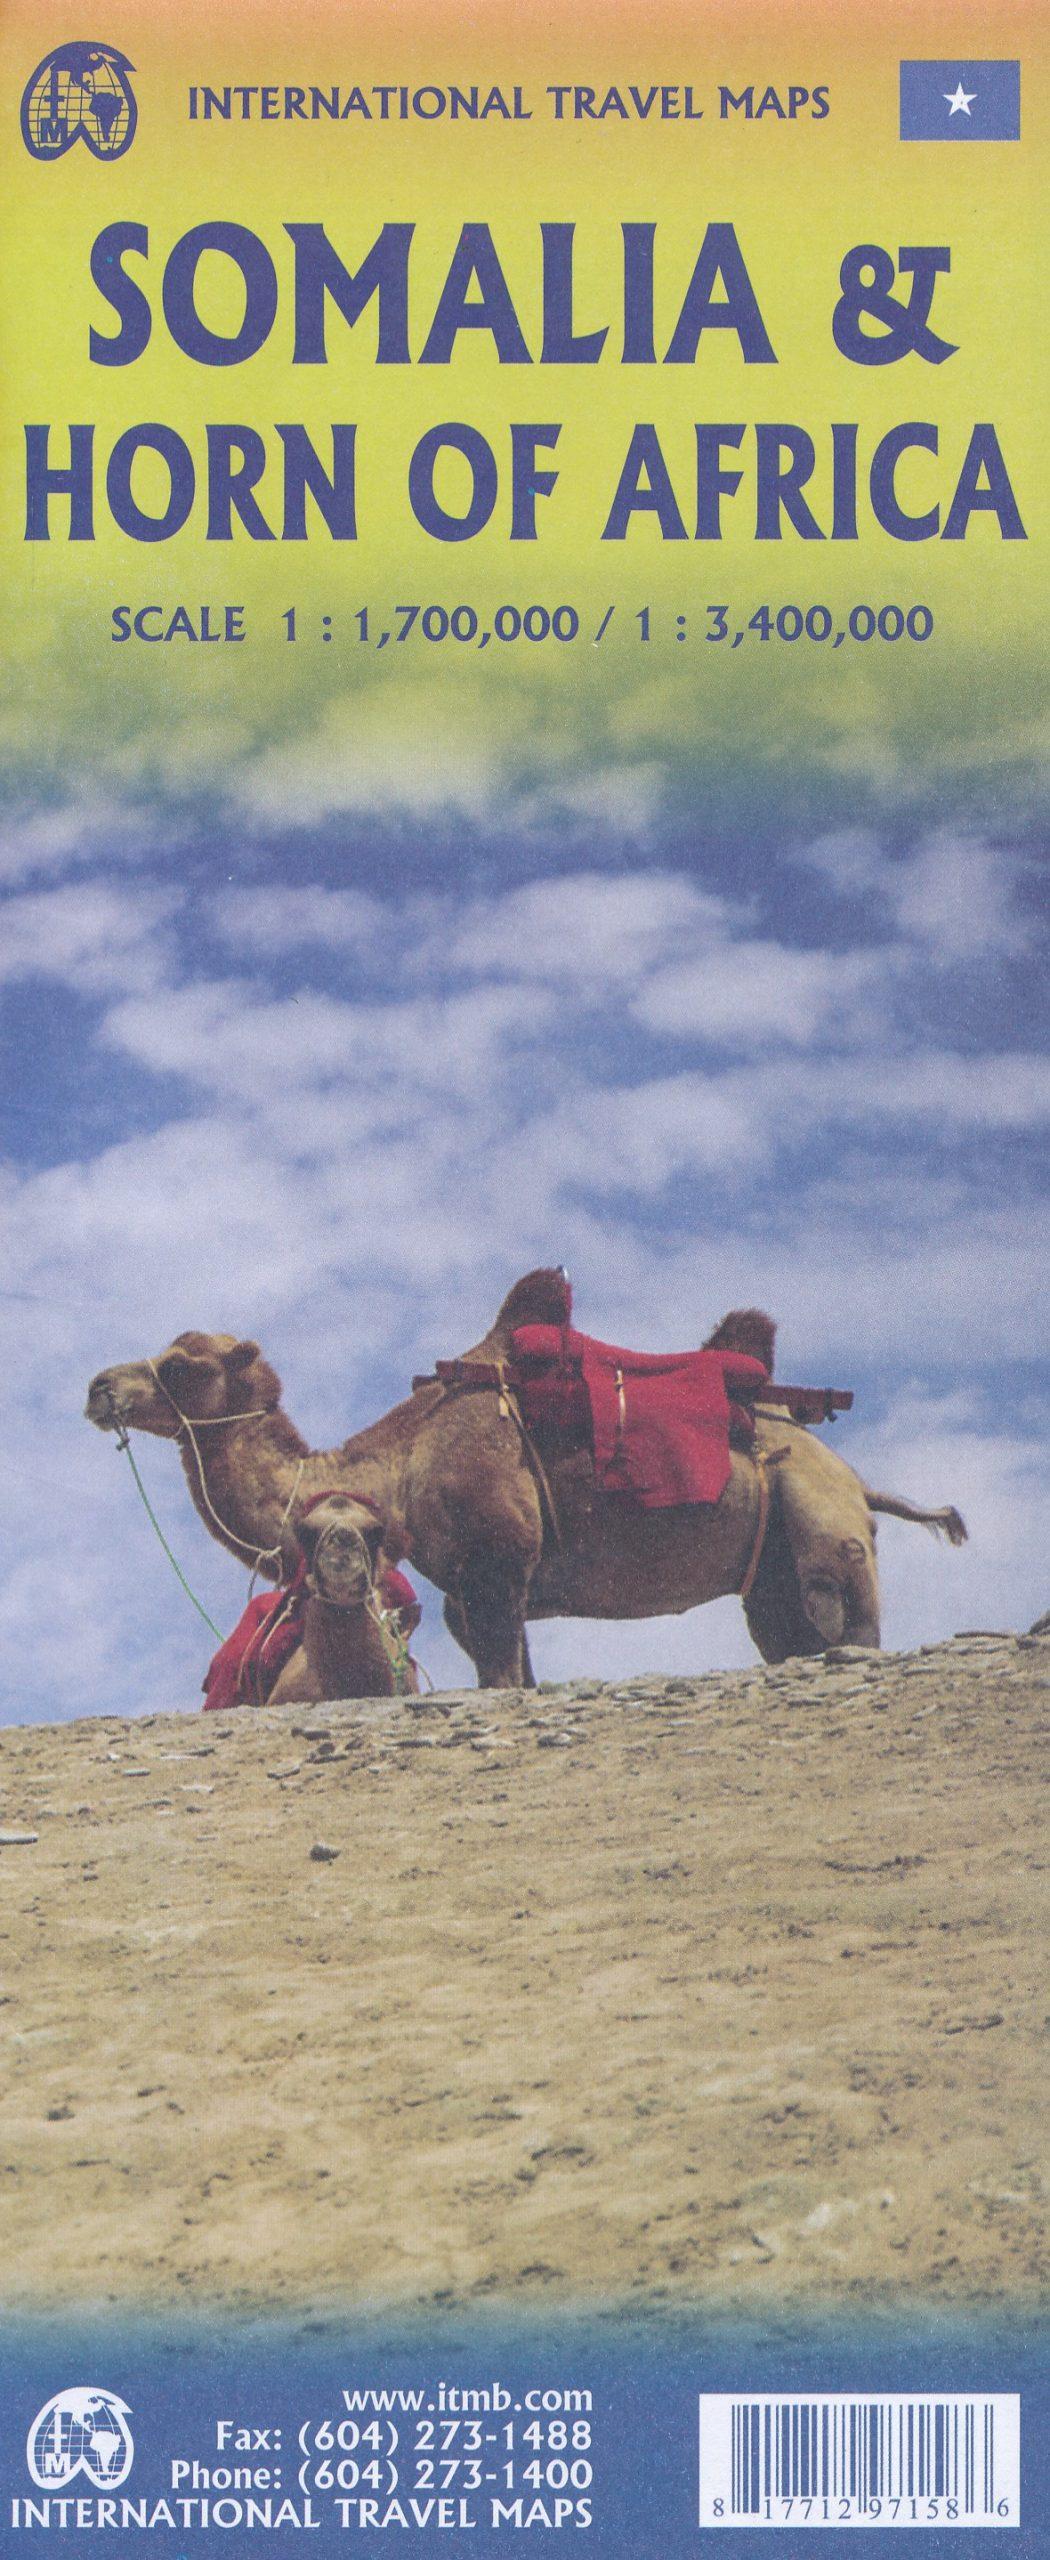 Wegenkaart – landkaart Somalië & Hoorn van Afrika | ITMB